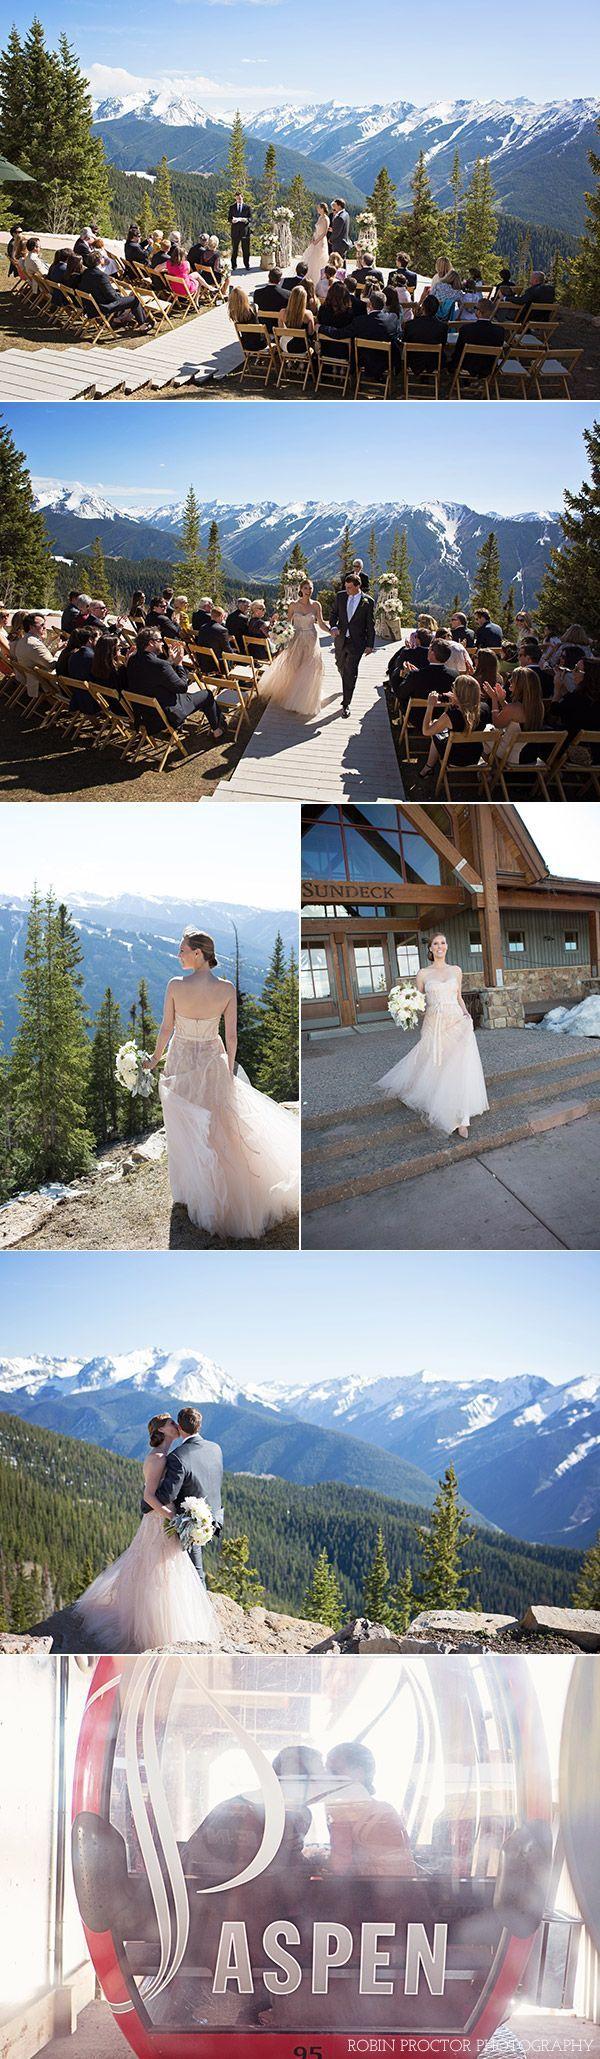 The little nell an intimate wedding in aspen ski themed weddings